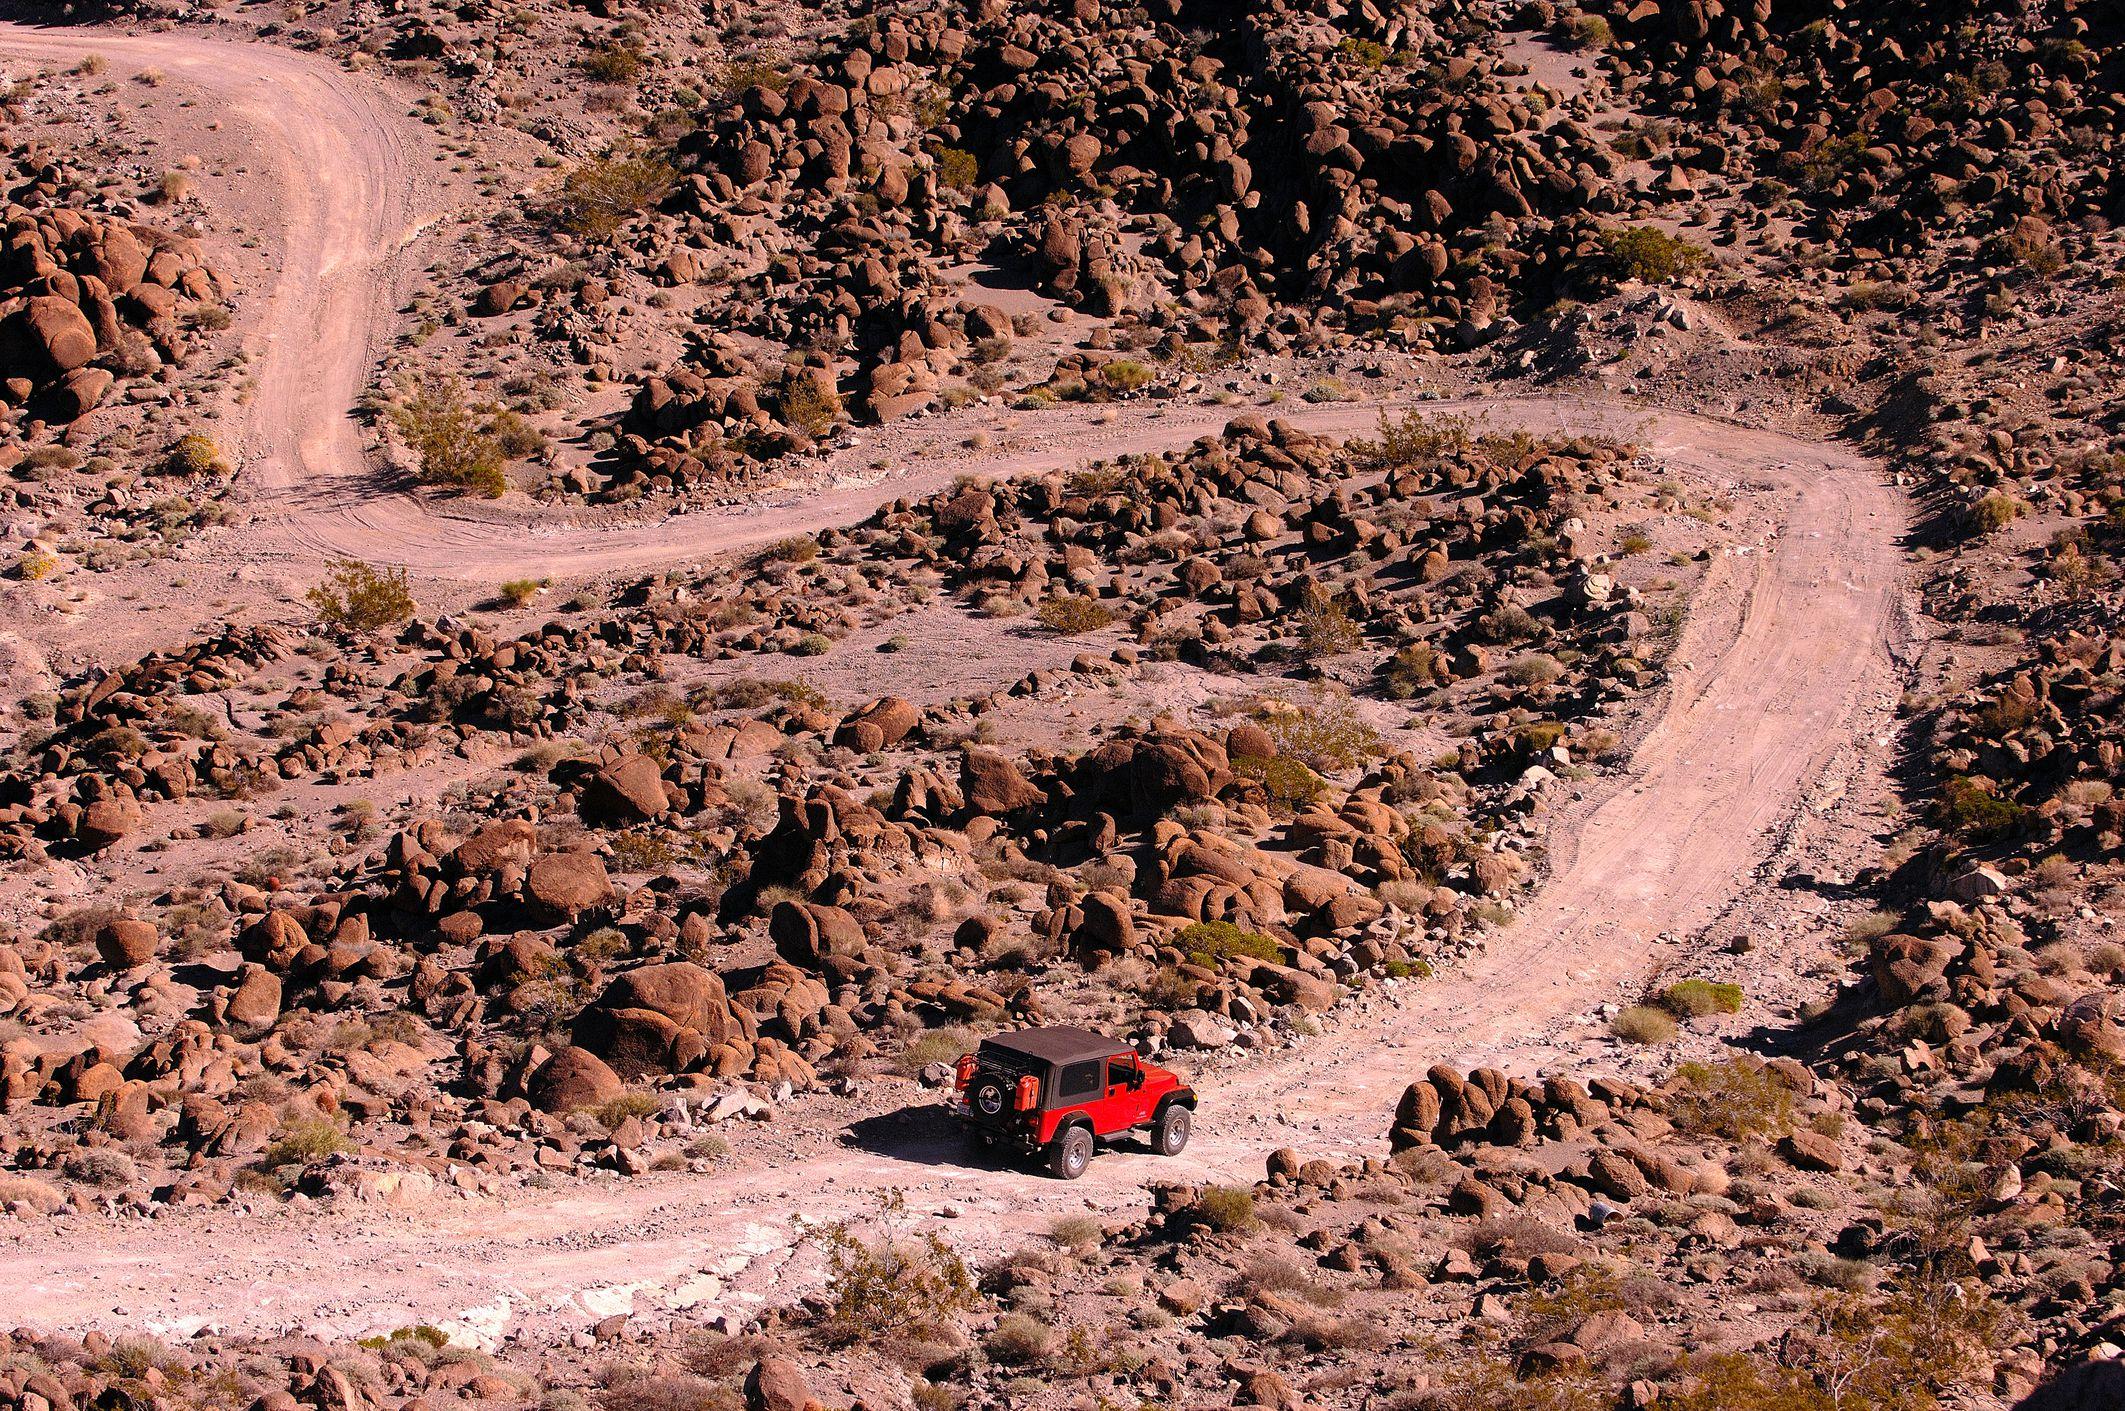 Jeep exploring Trail within Bristol Mountains, Mojave Desert, California, USA